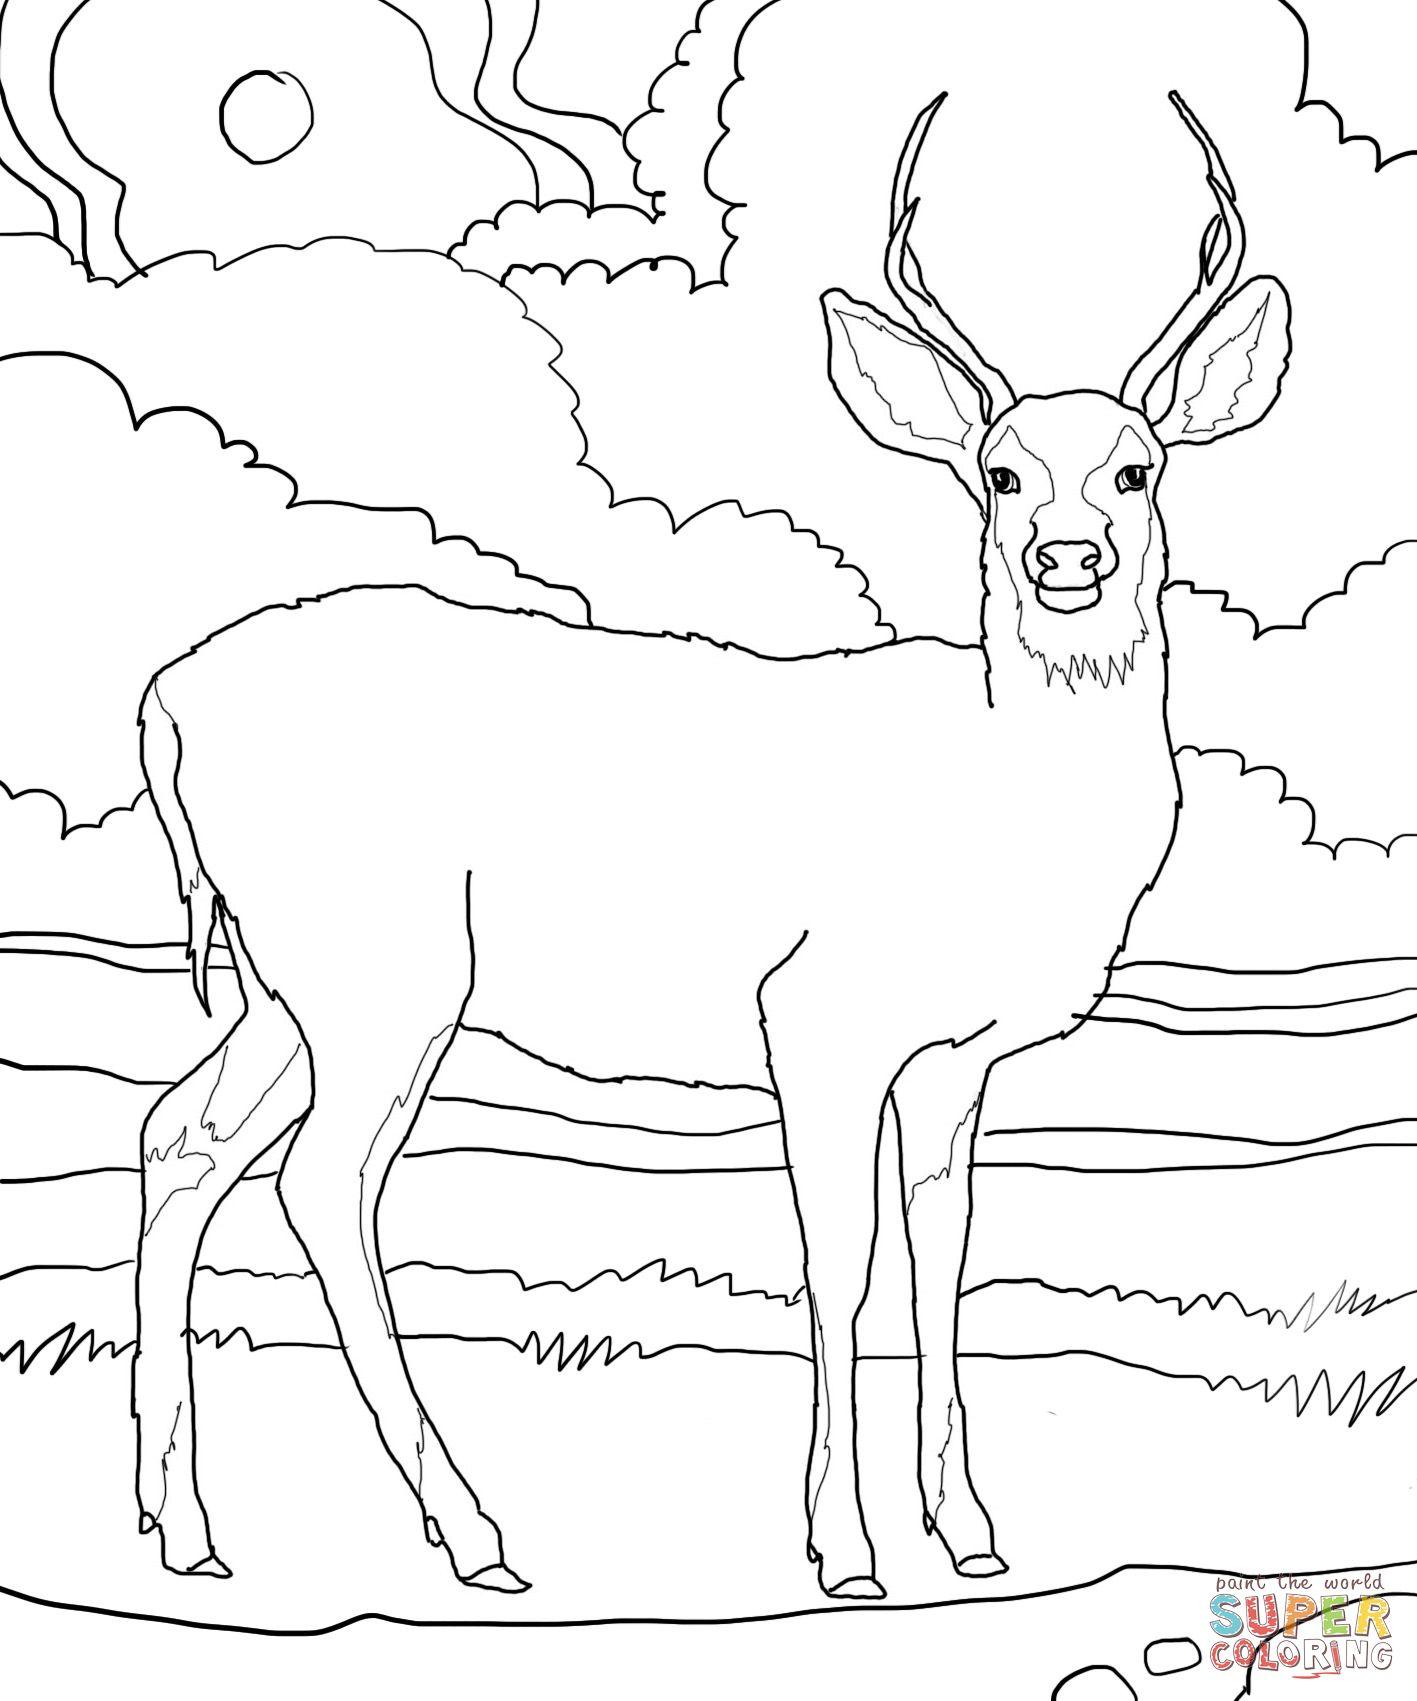 Mule Deer Coloring Page Supercoloring Com Deer Coloring Pages